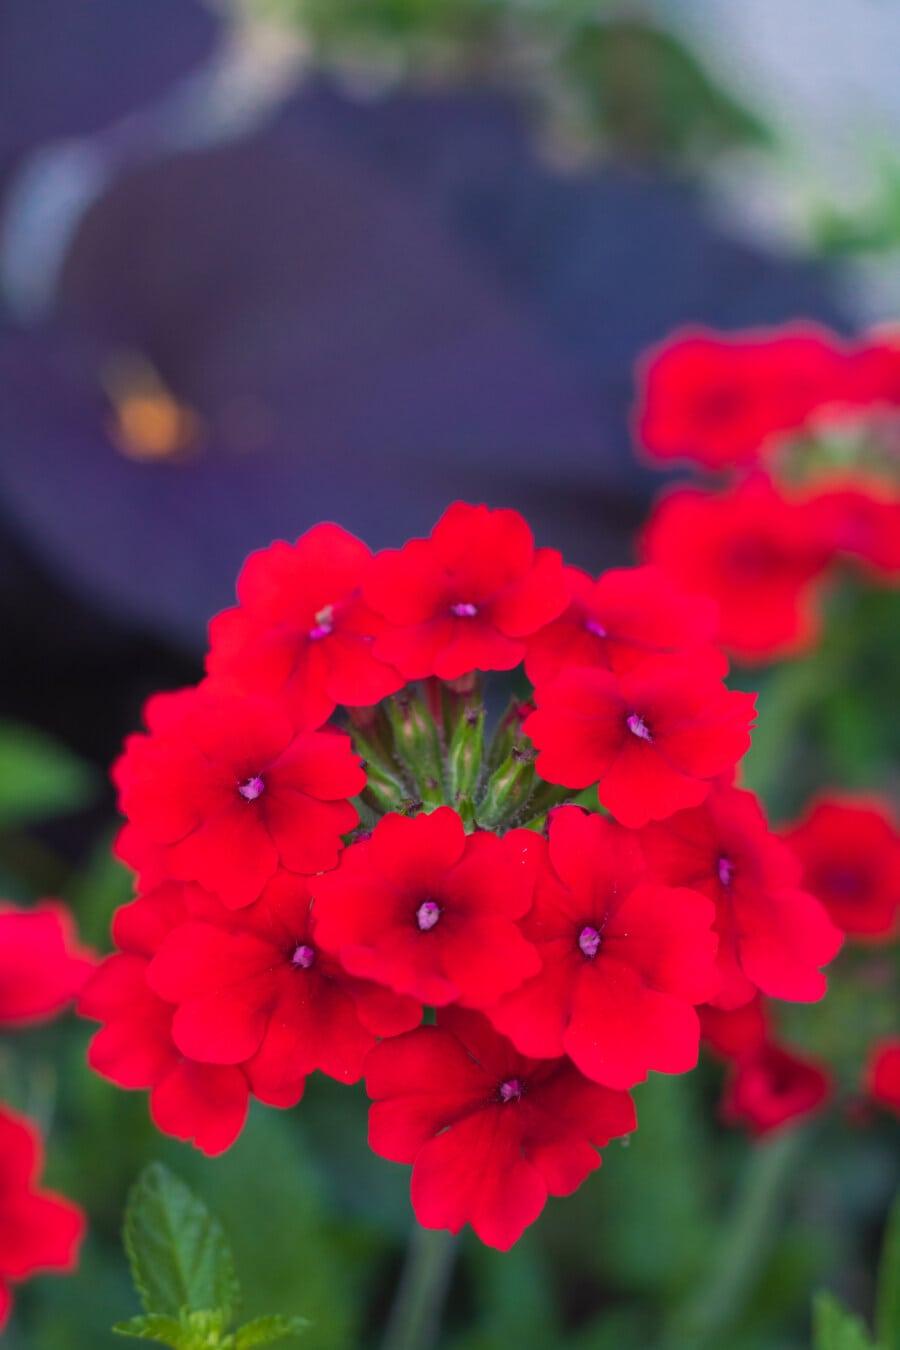 rot, Blumentopf, Blumen, hell, Garten, Flora, Blütenblatt, Blume, Natur, Sommer